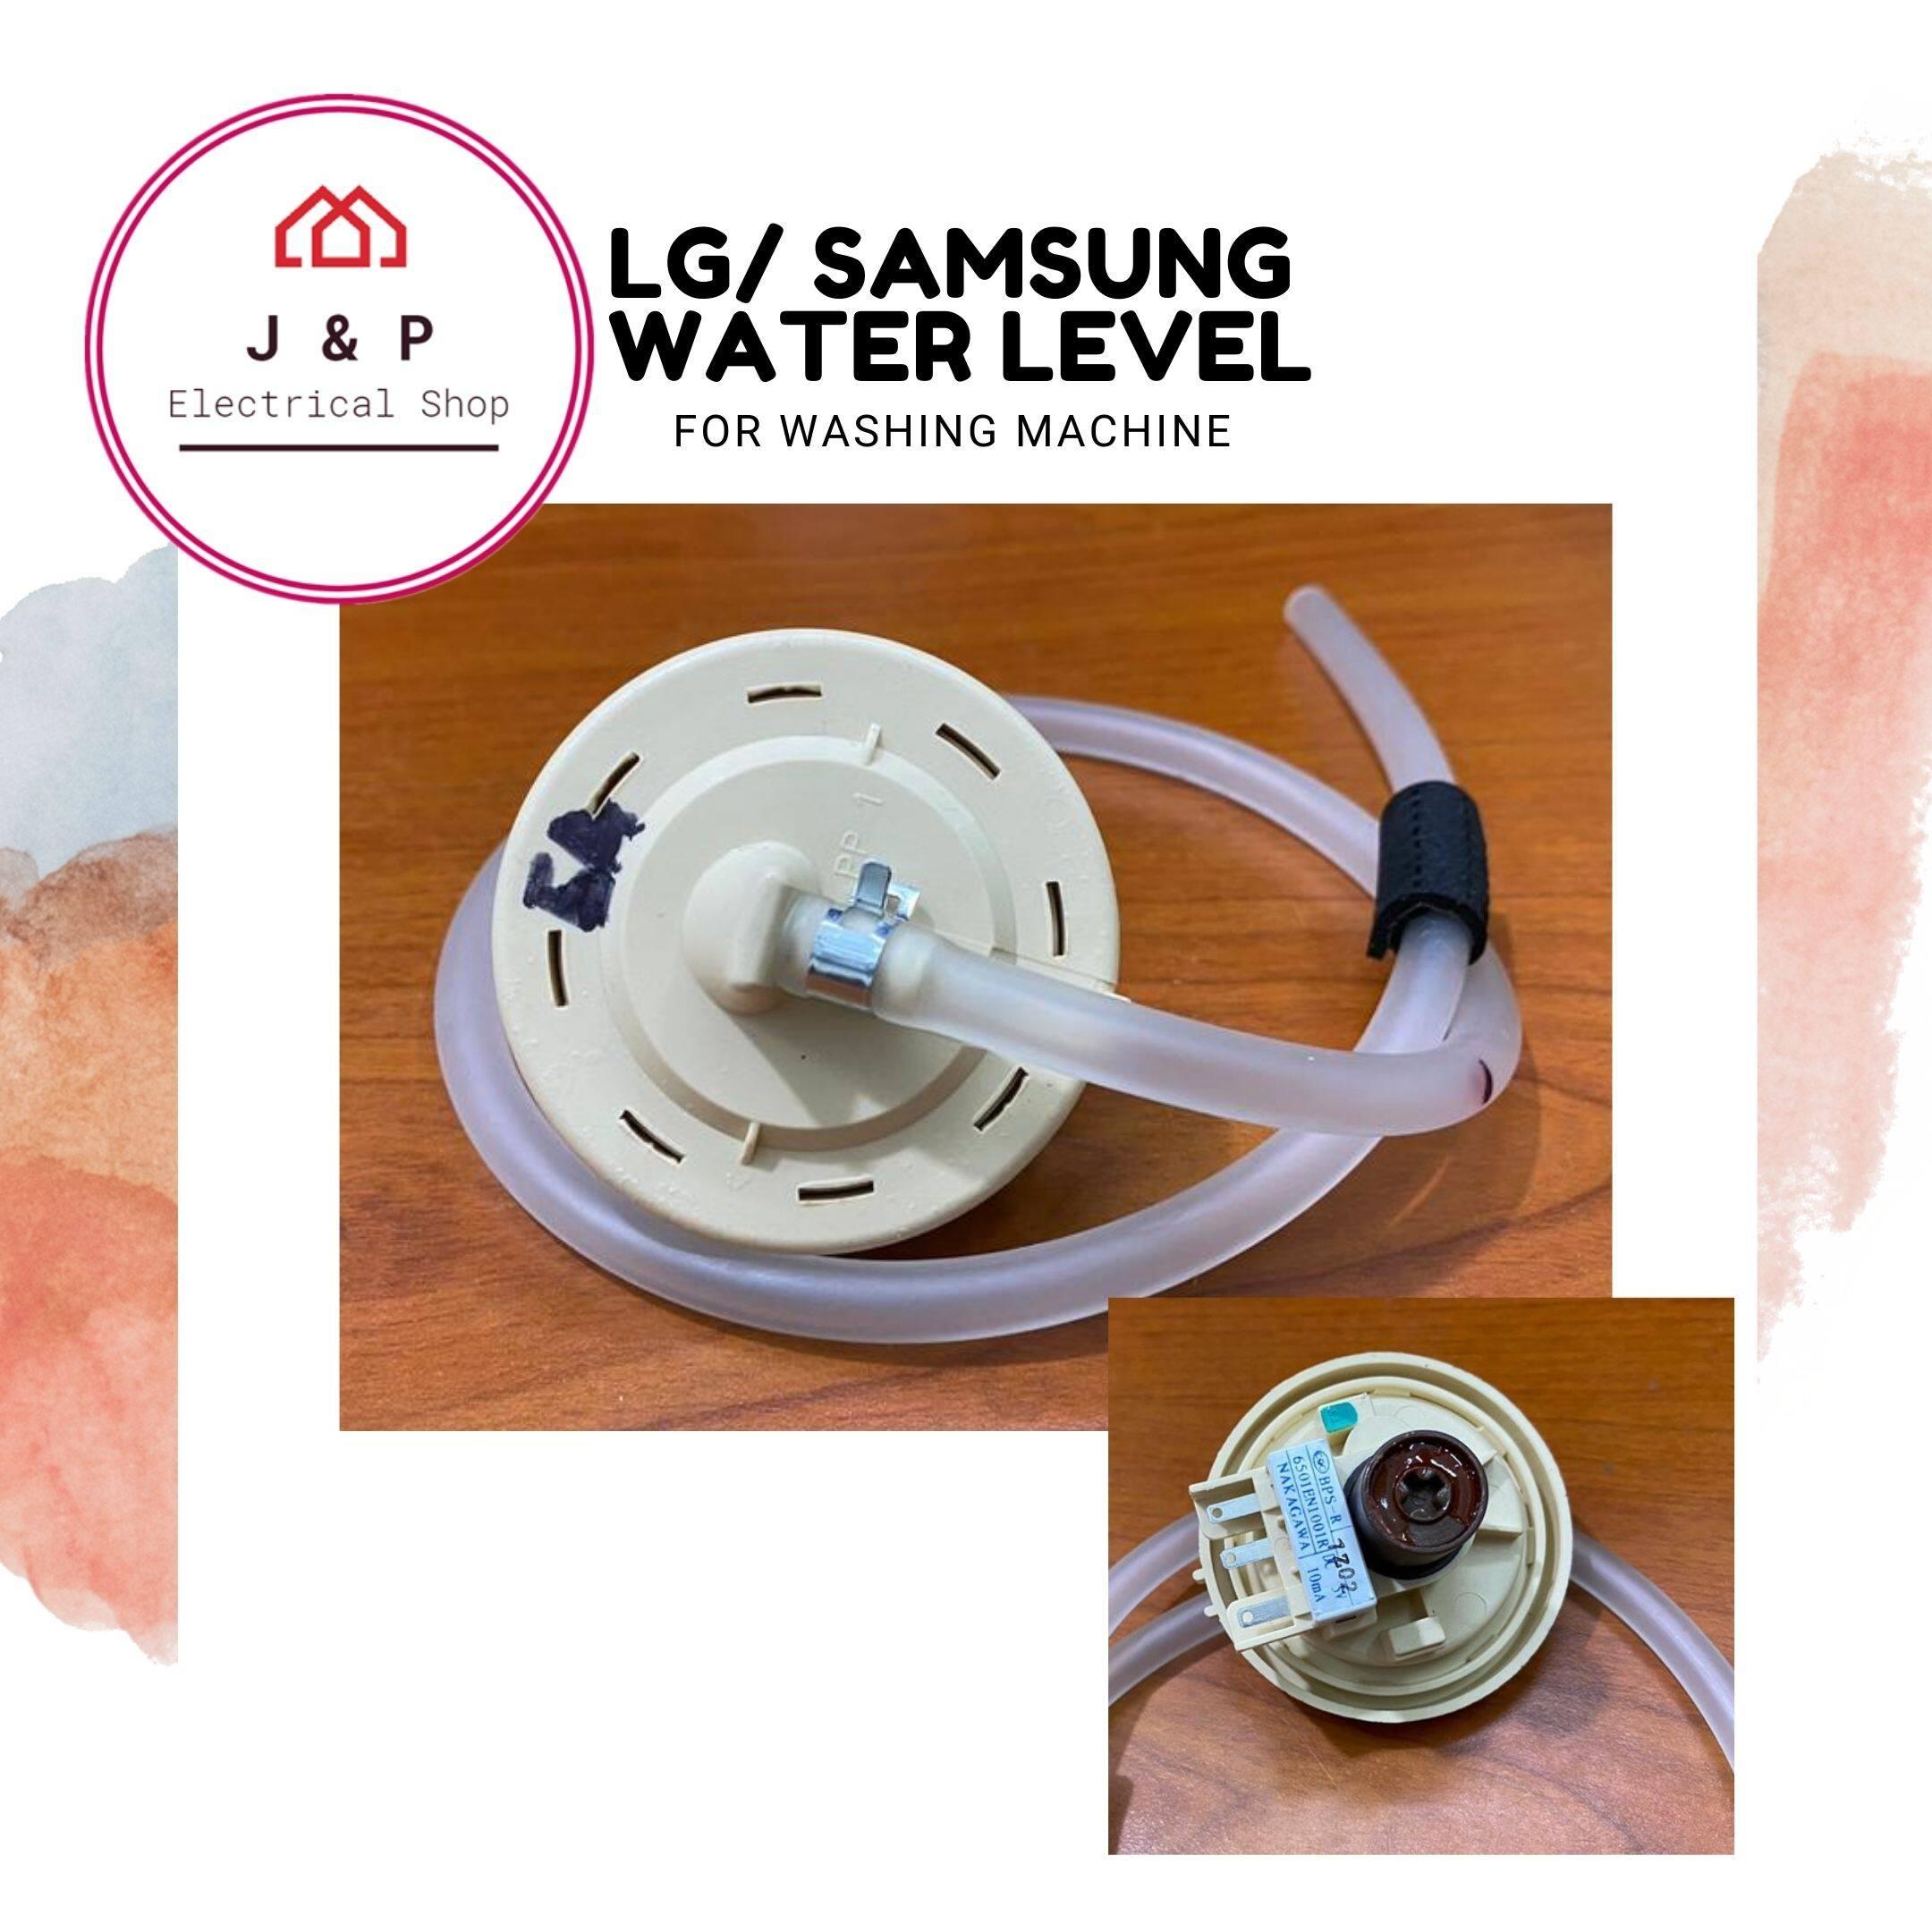 LG/ SAMSUNG Washing Machine Water Level Switch (READY STOCK)1378428328-1598440882783-0